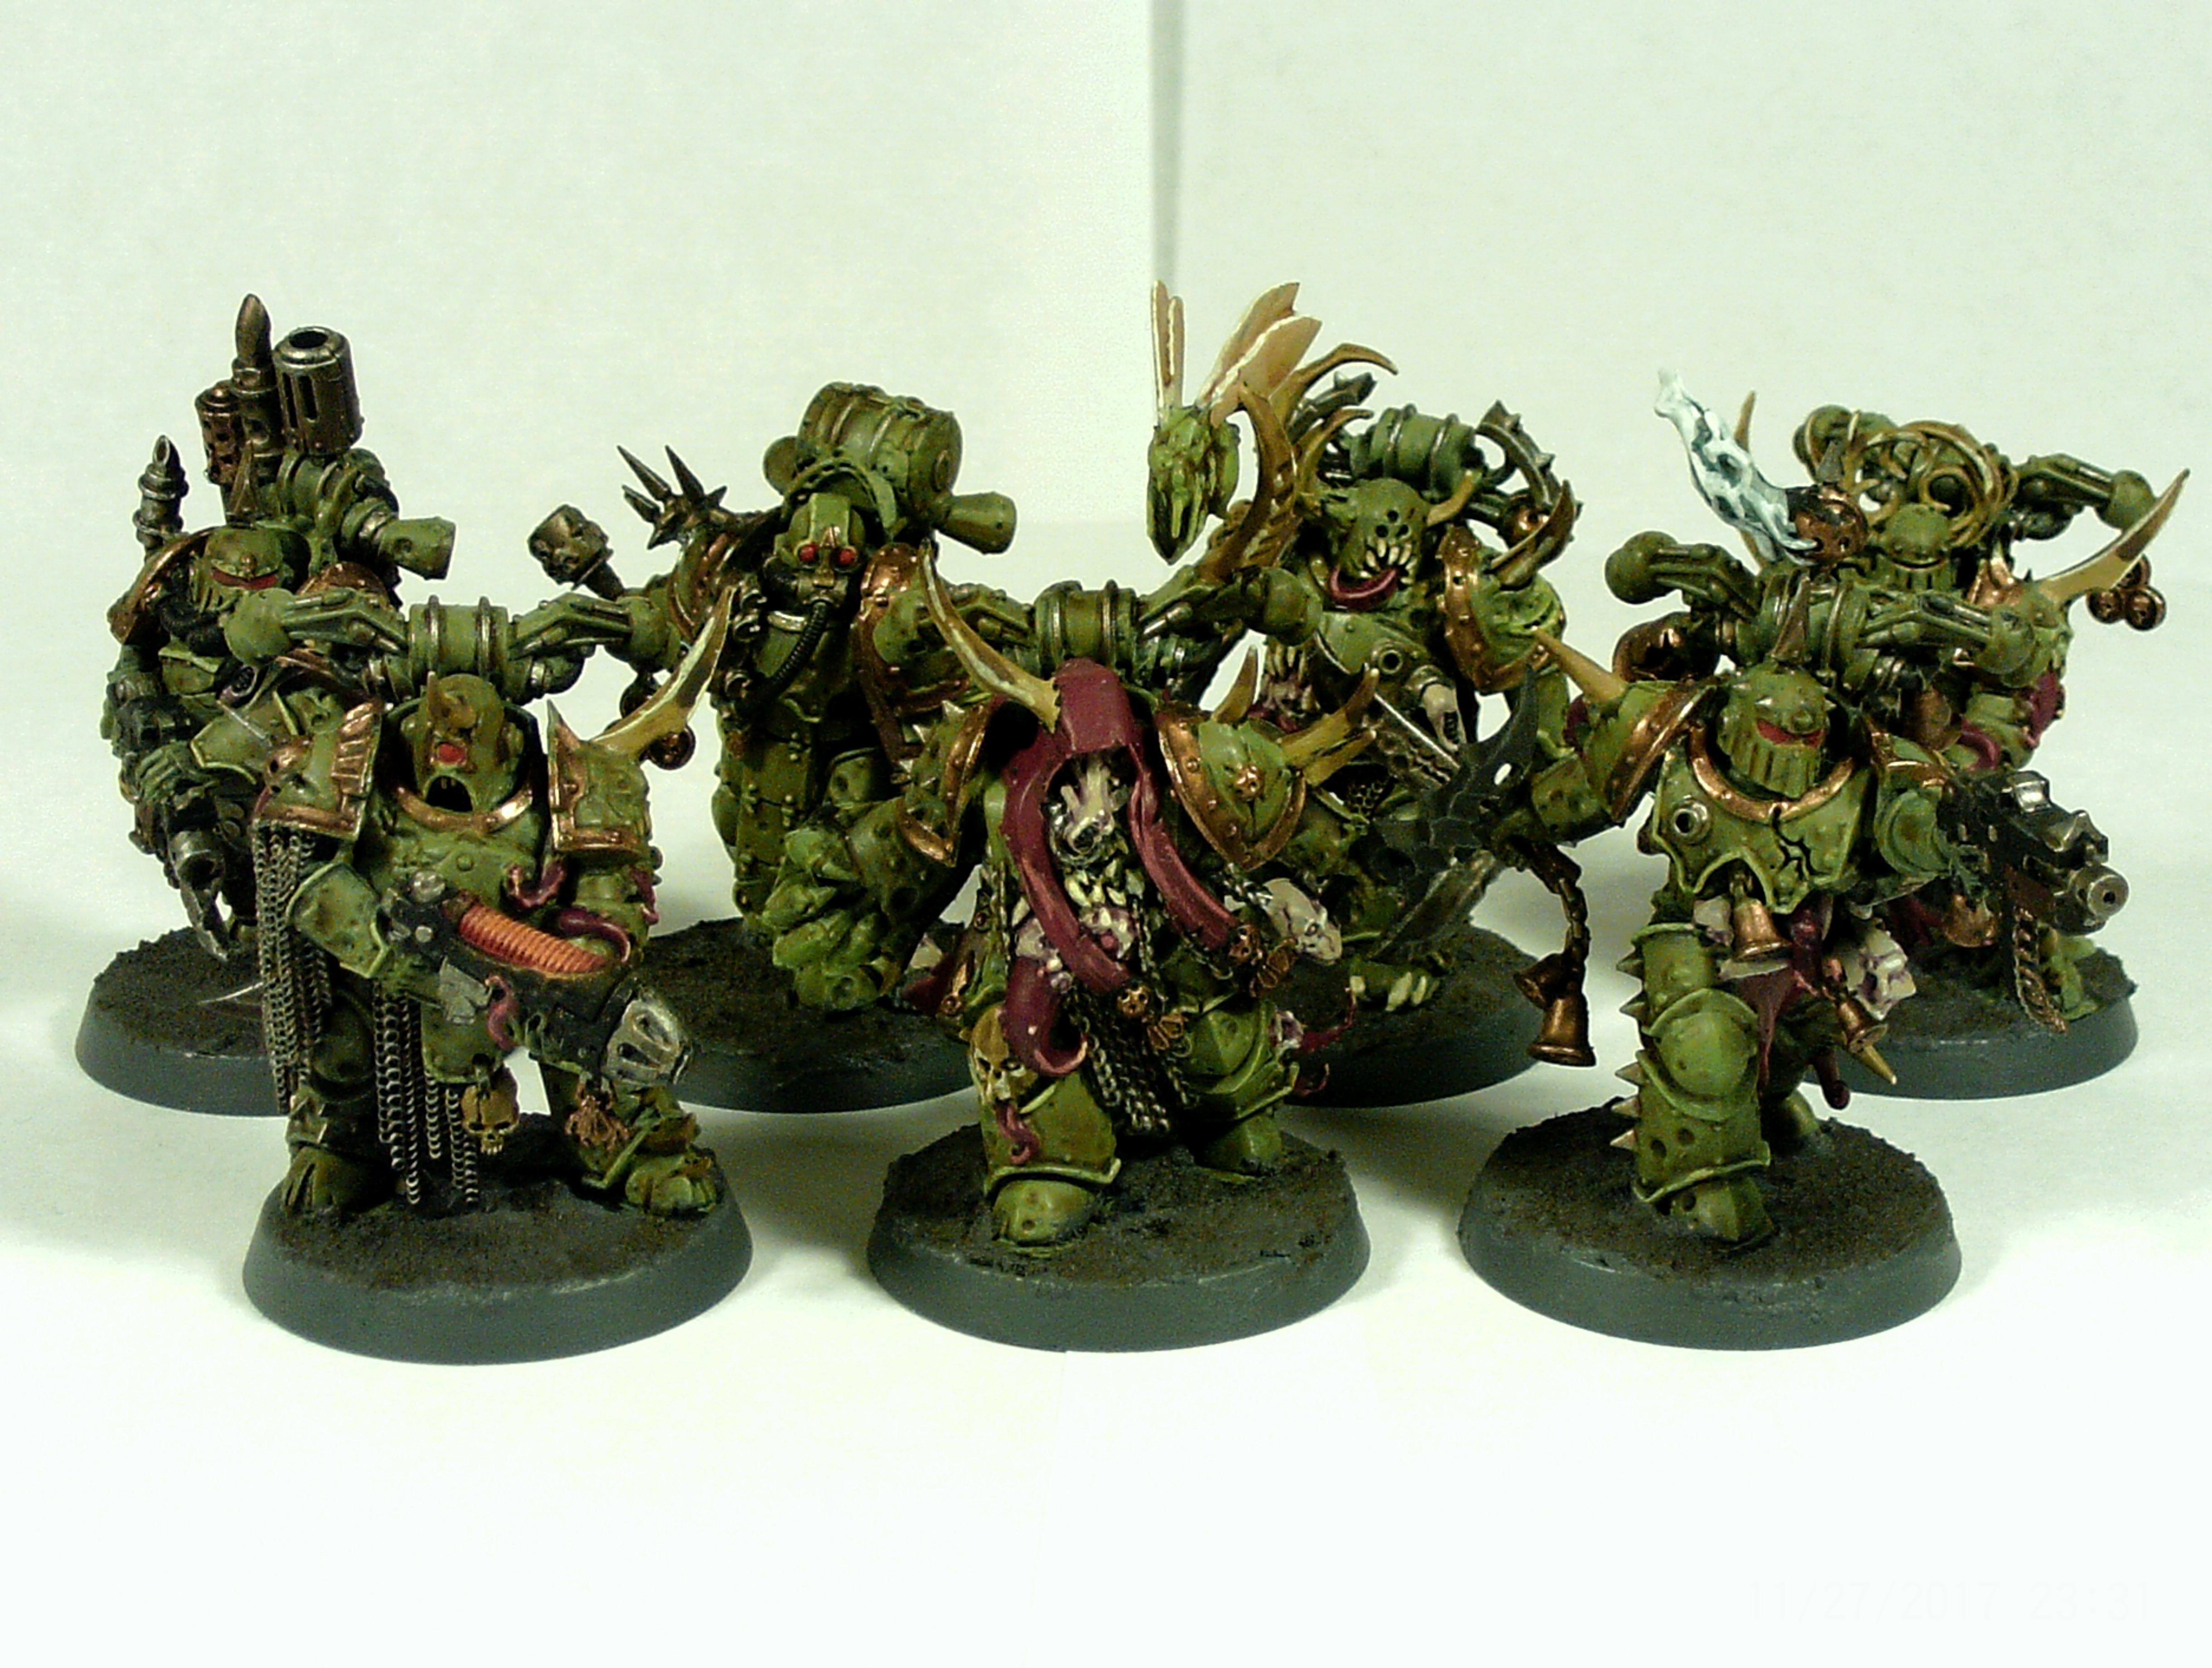 Blight, Chaos, Dark, Death, Guard, Imperium, Nurgle, Plague, Rot, Space, Space Marines